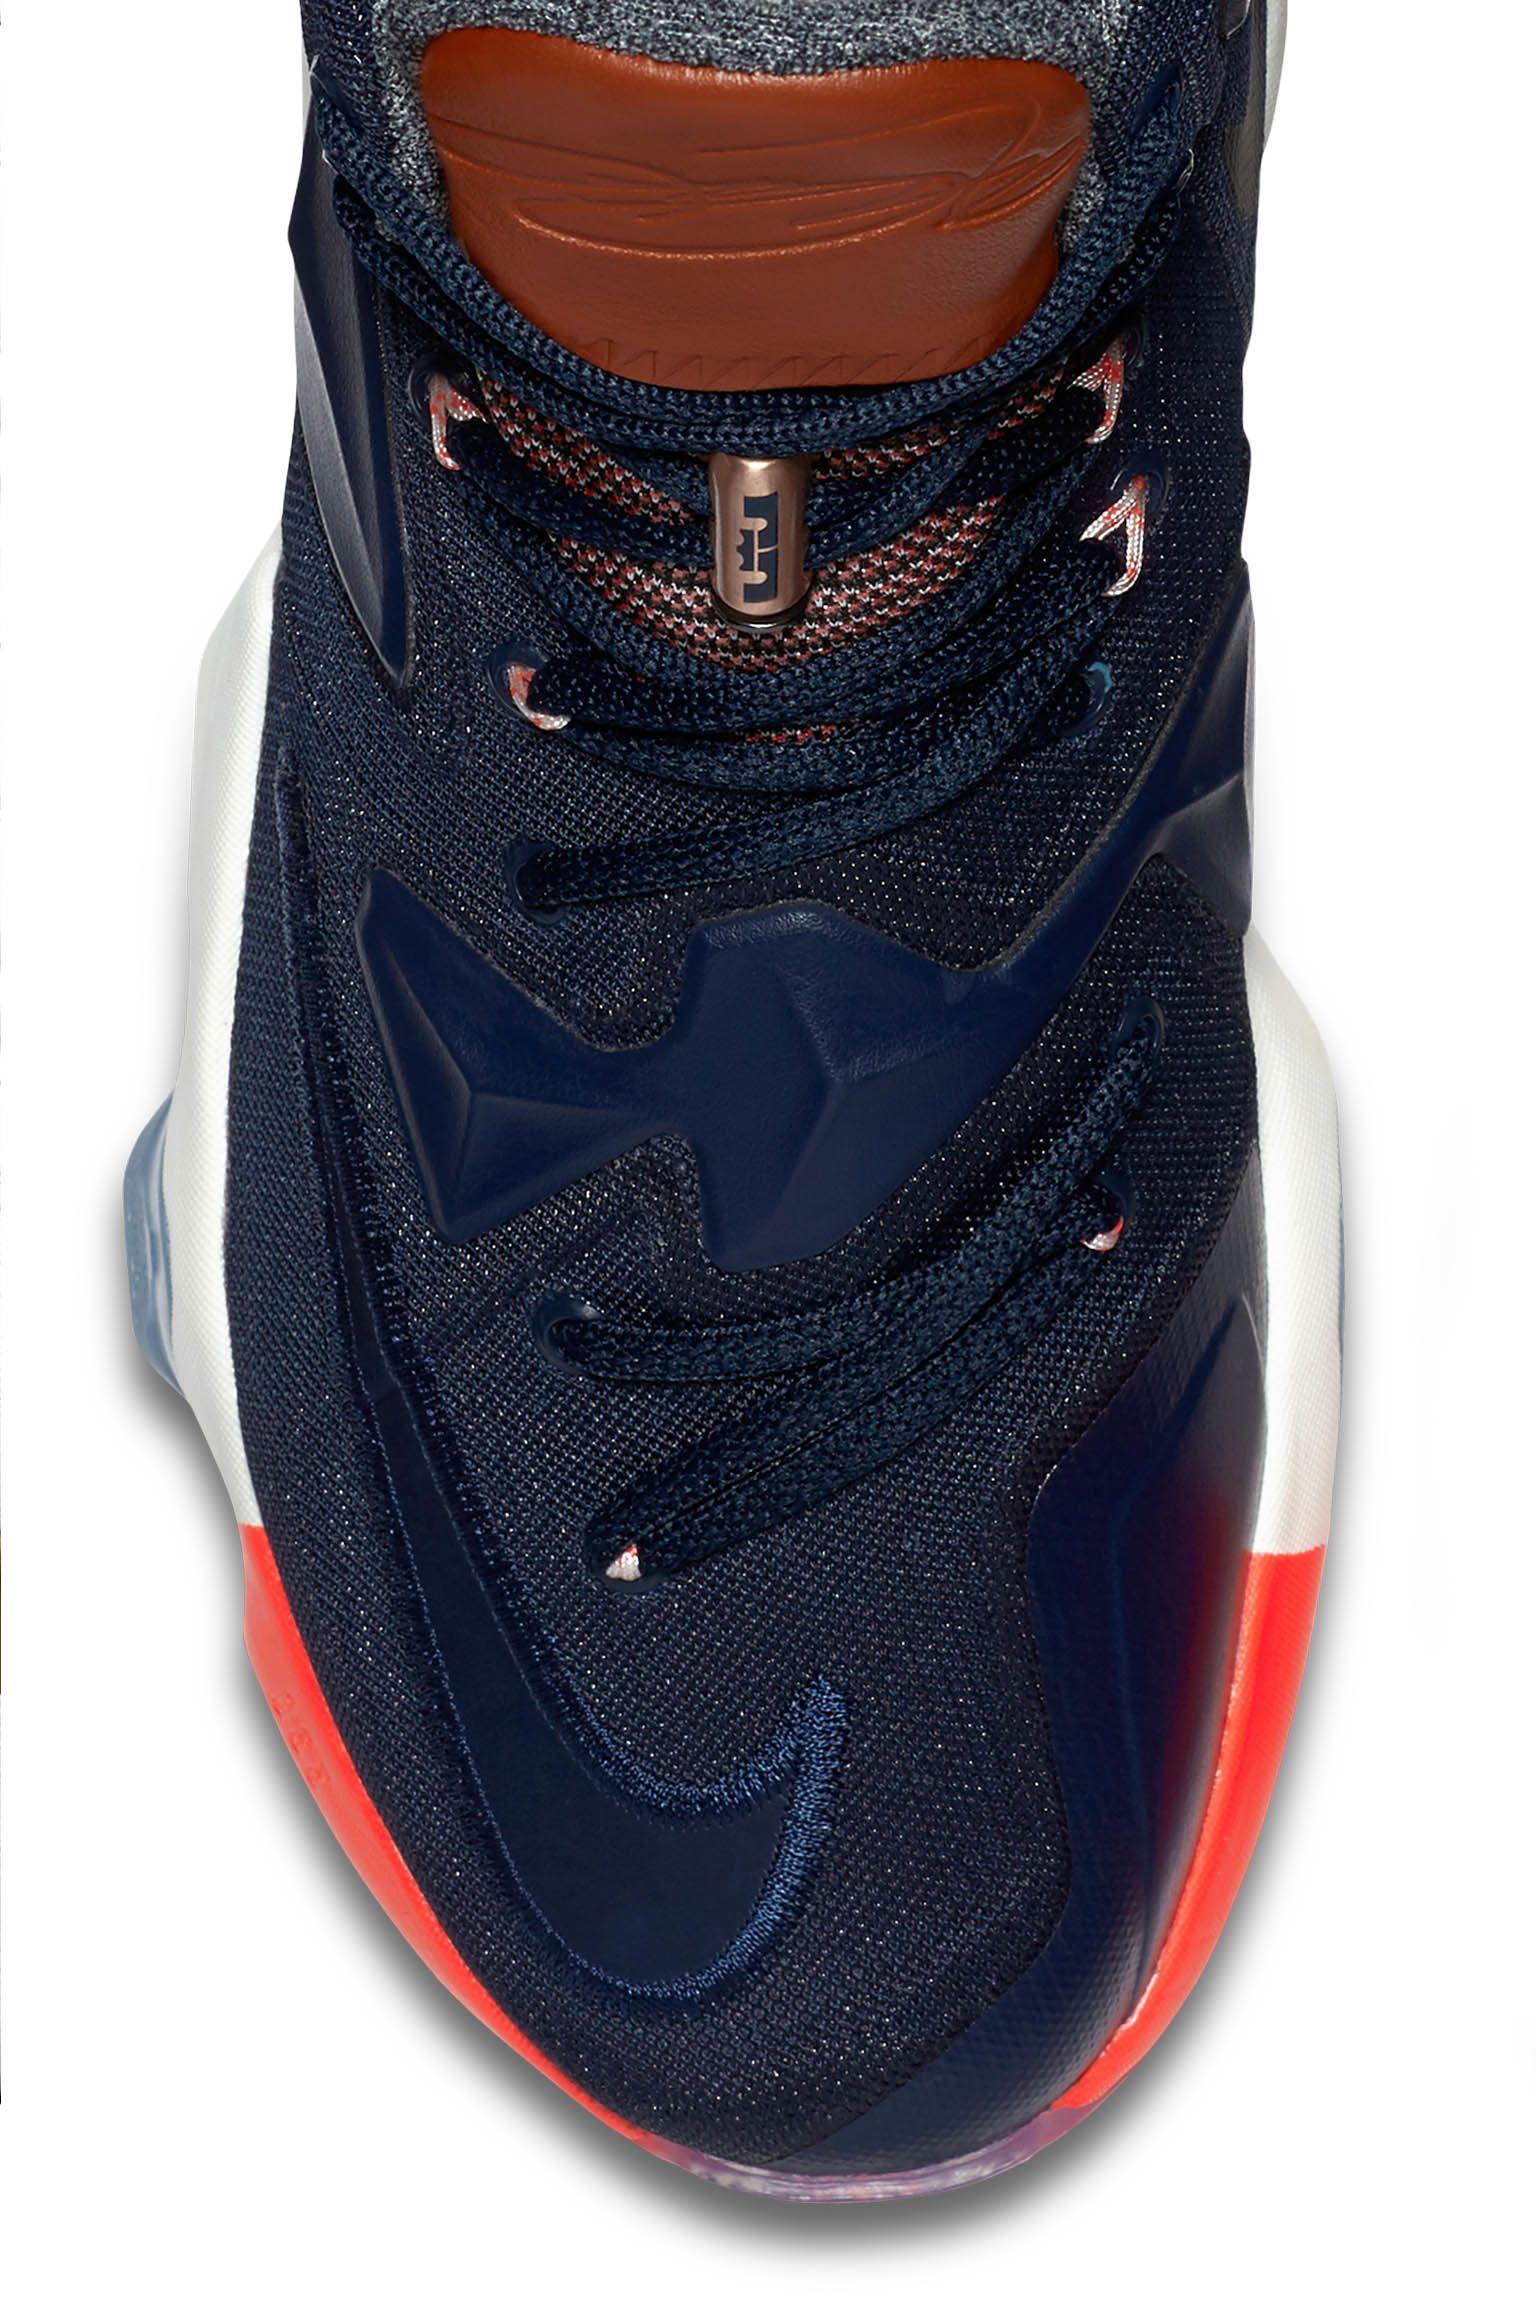 Nike LeBron 8 LMTD 'LuxBron' Release Date